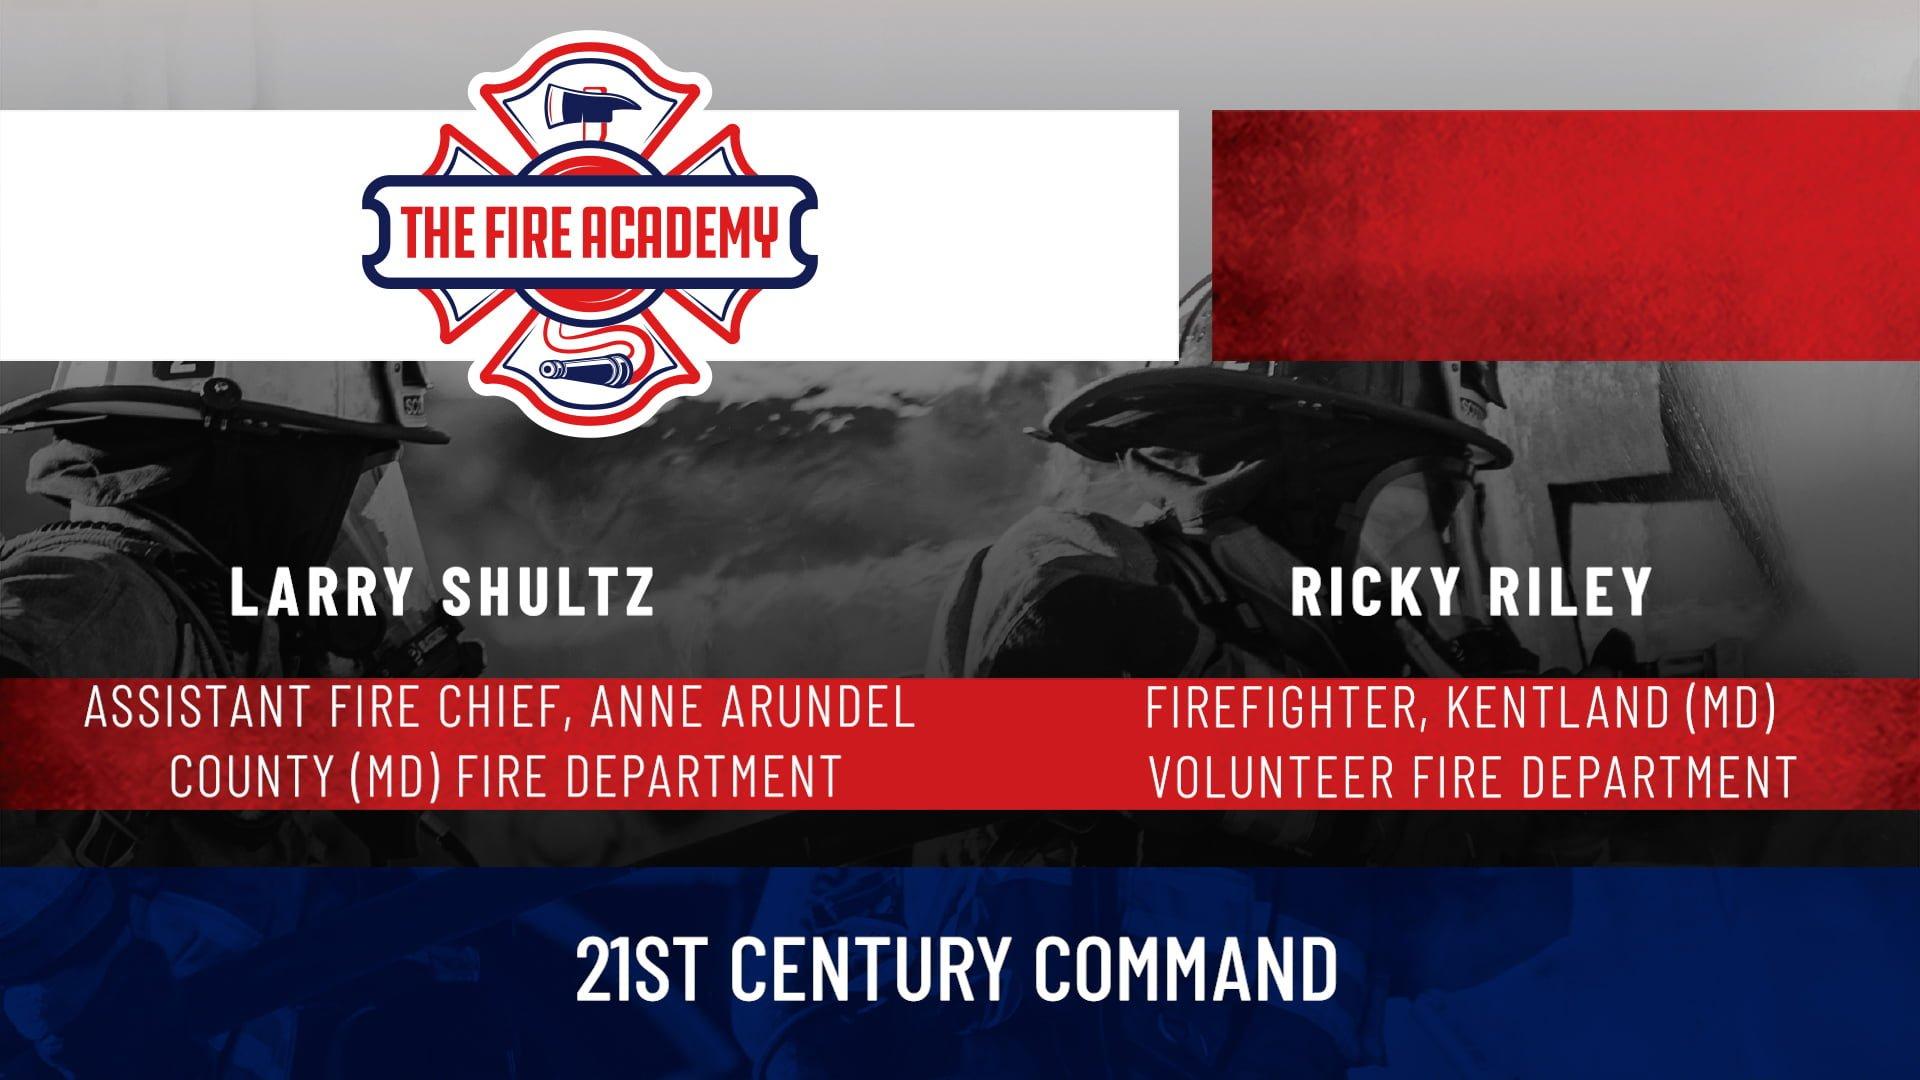 21st Century Command